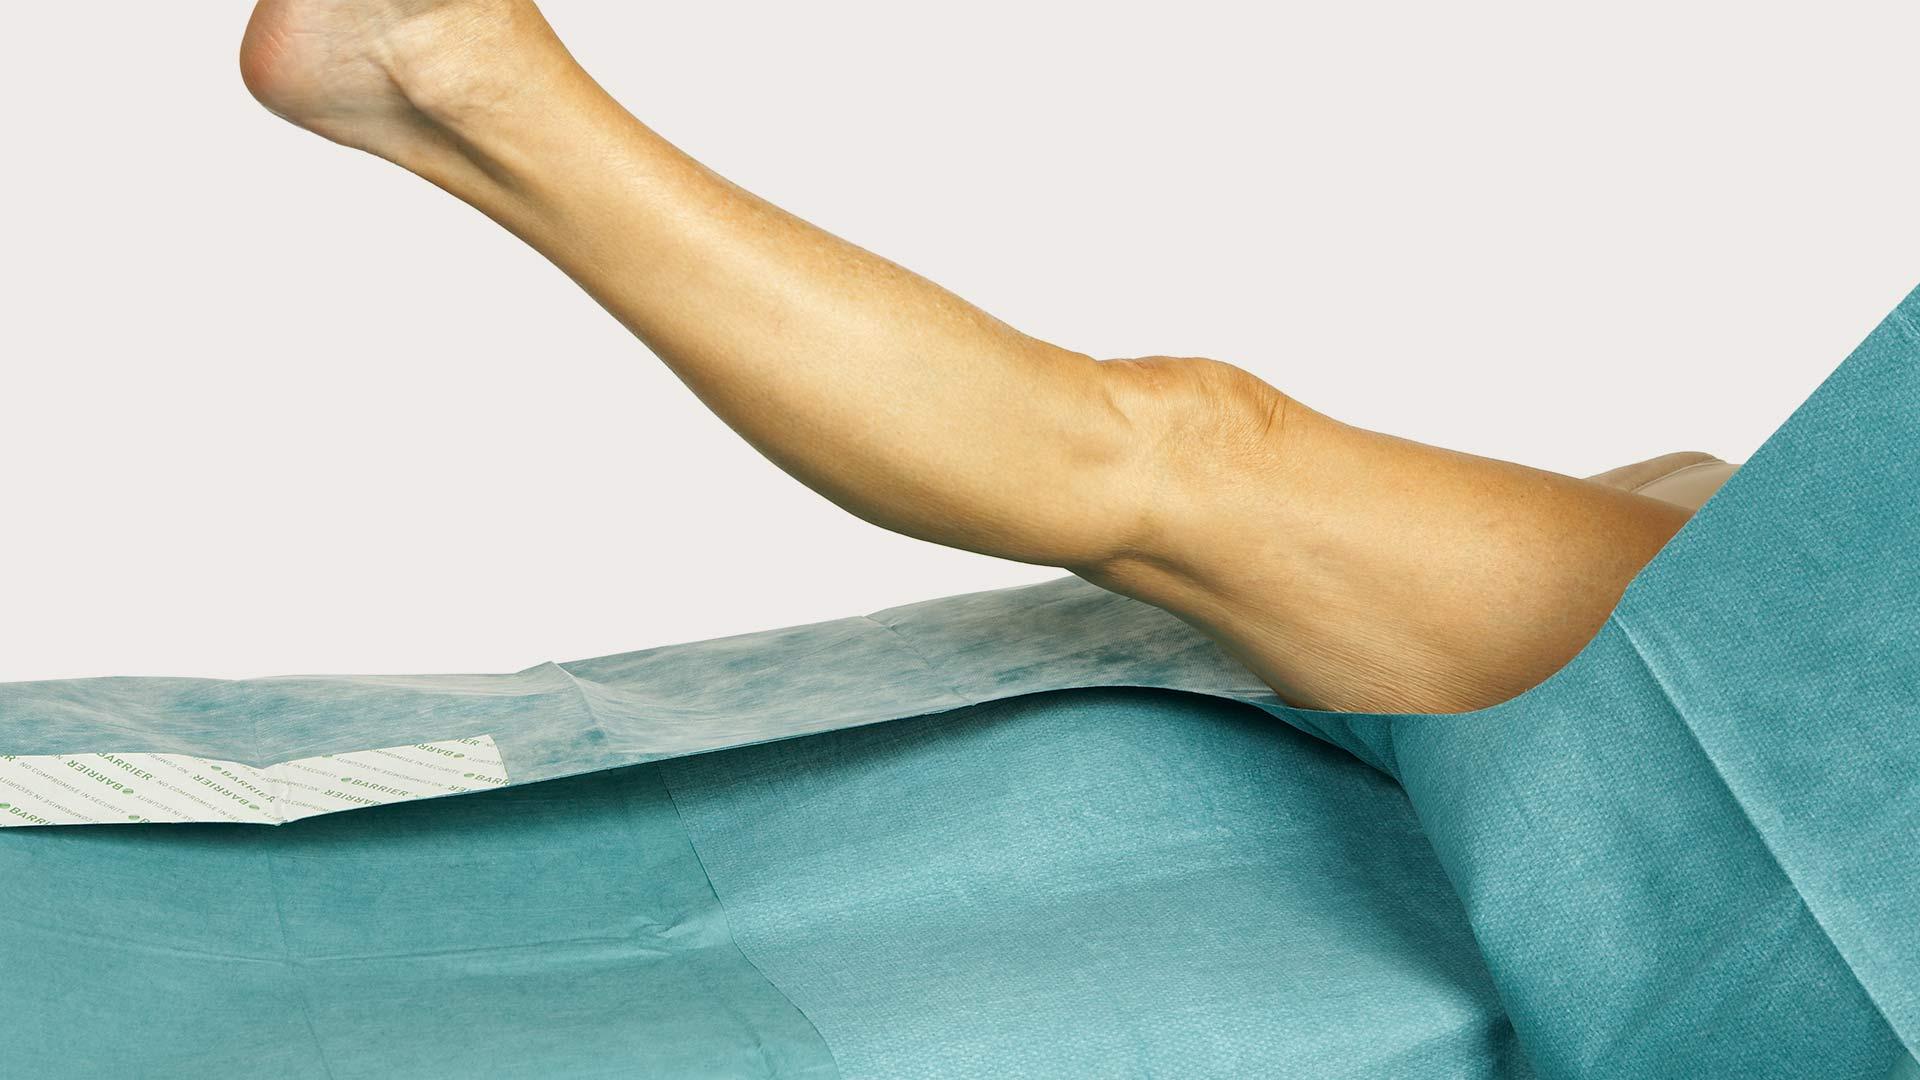 barrier split sheet drapes for a large variety procedures mölnlycke